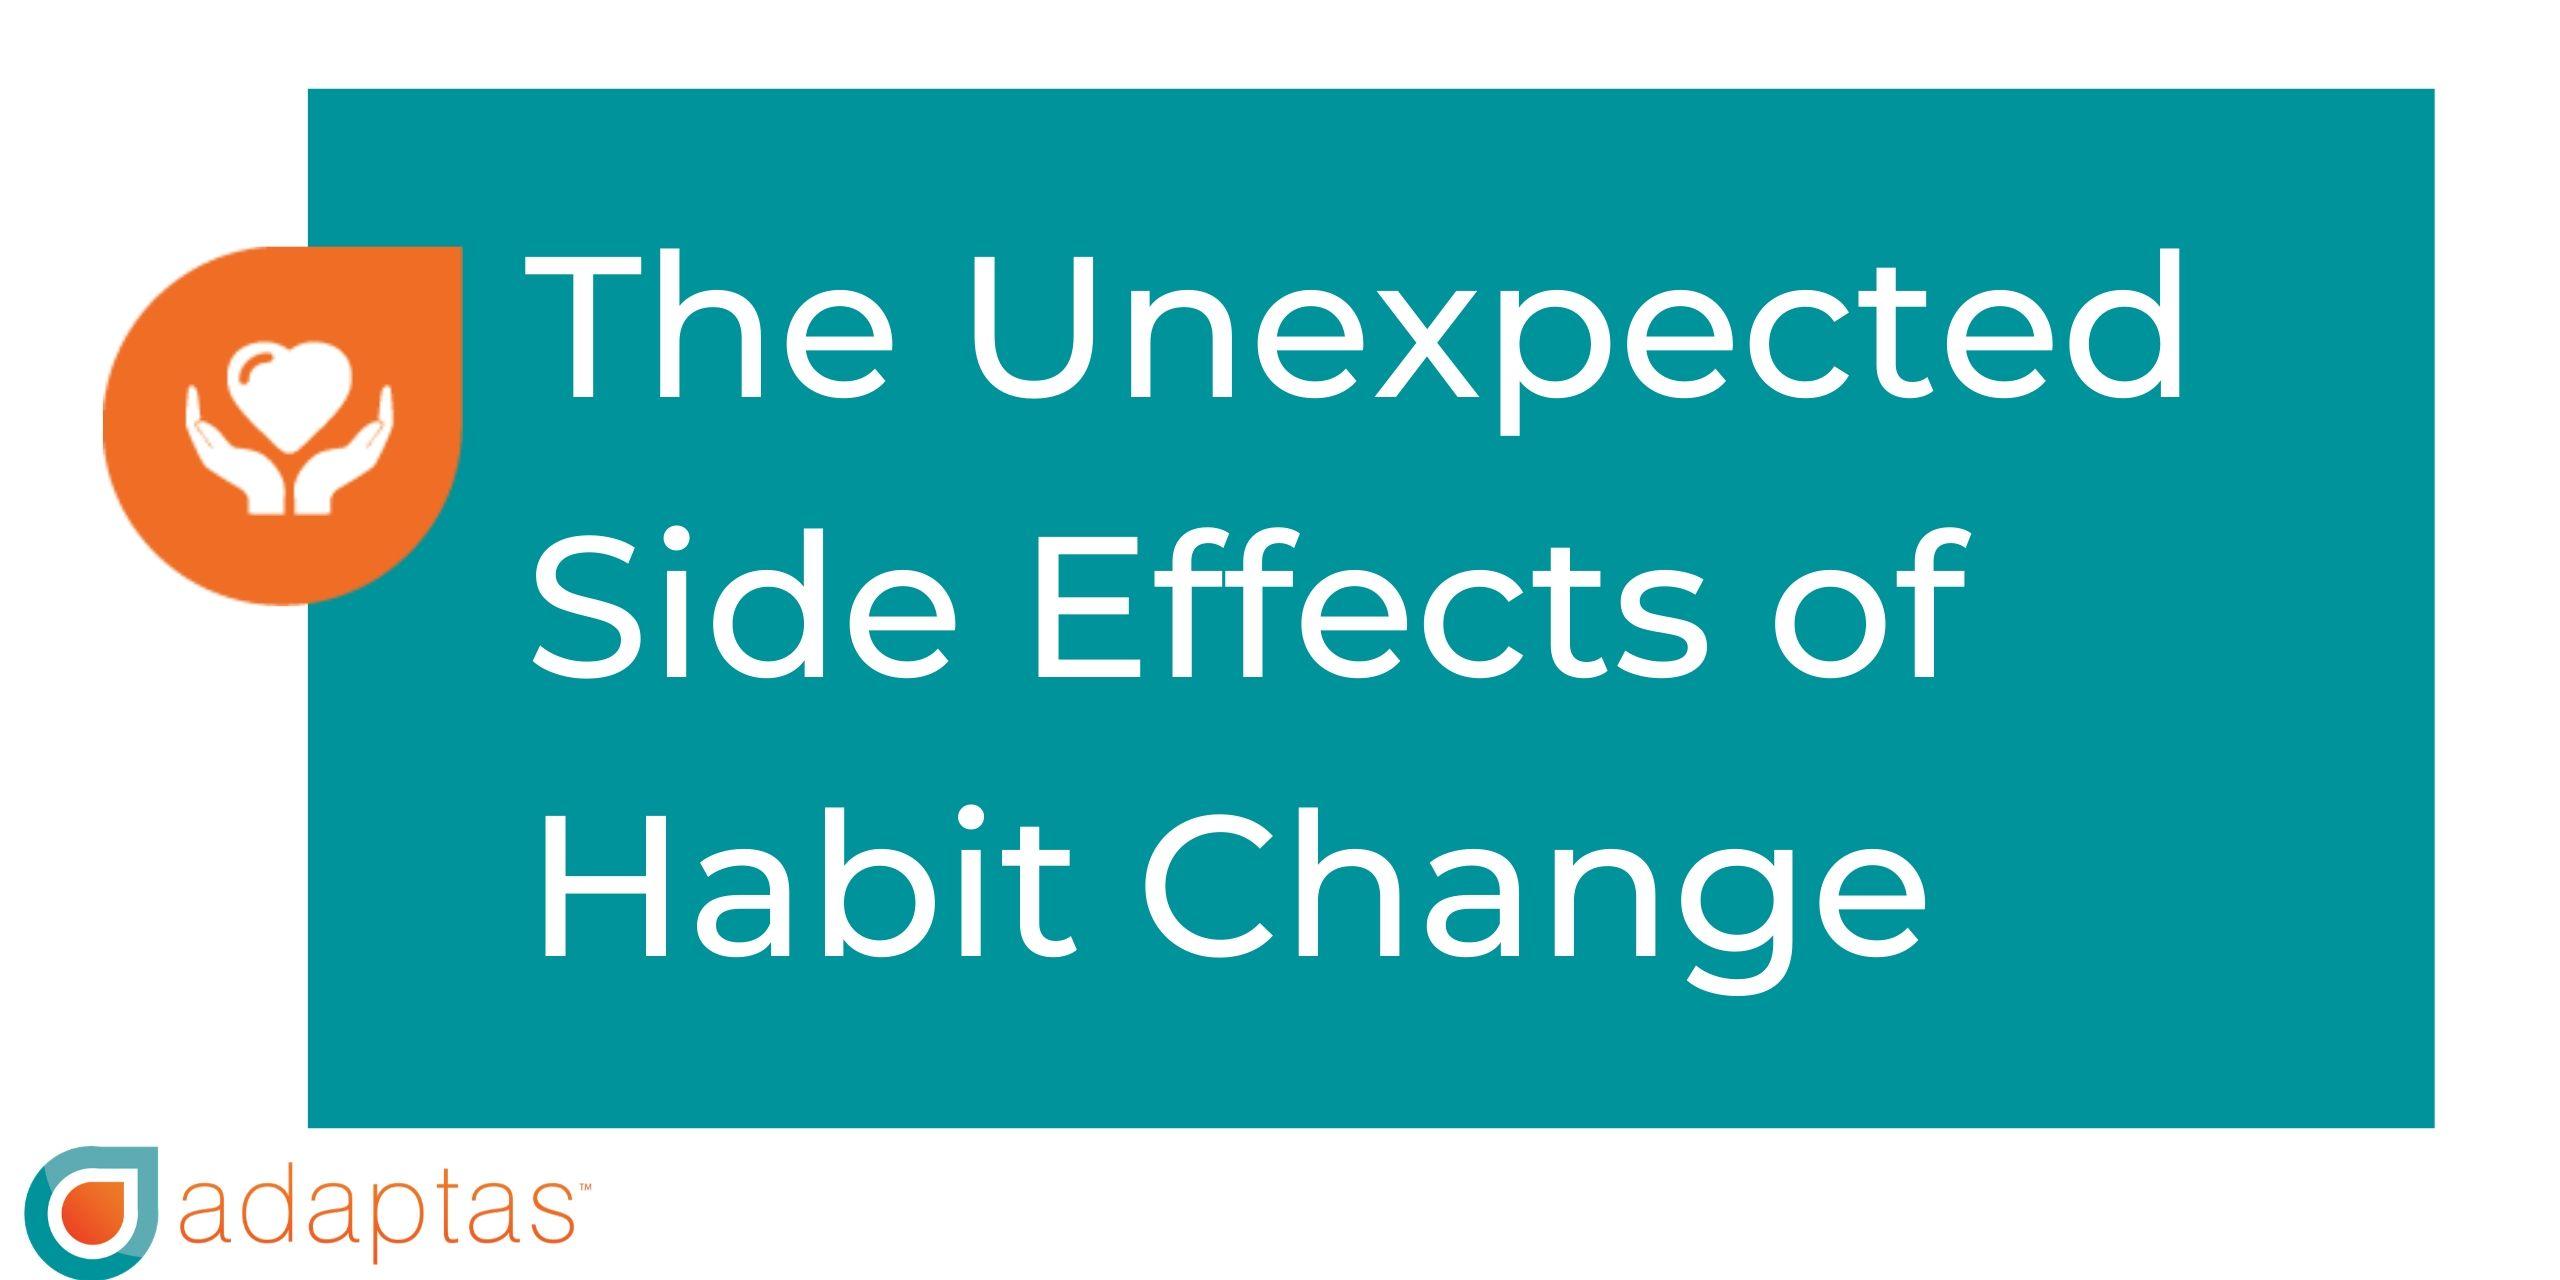 habit change